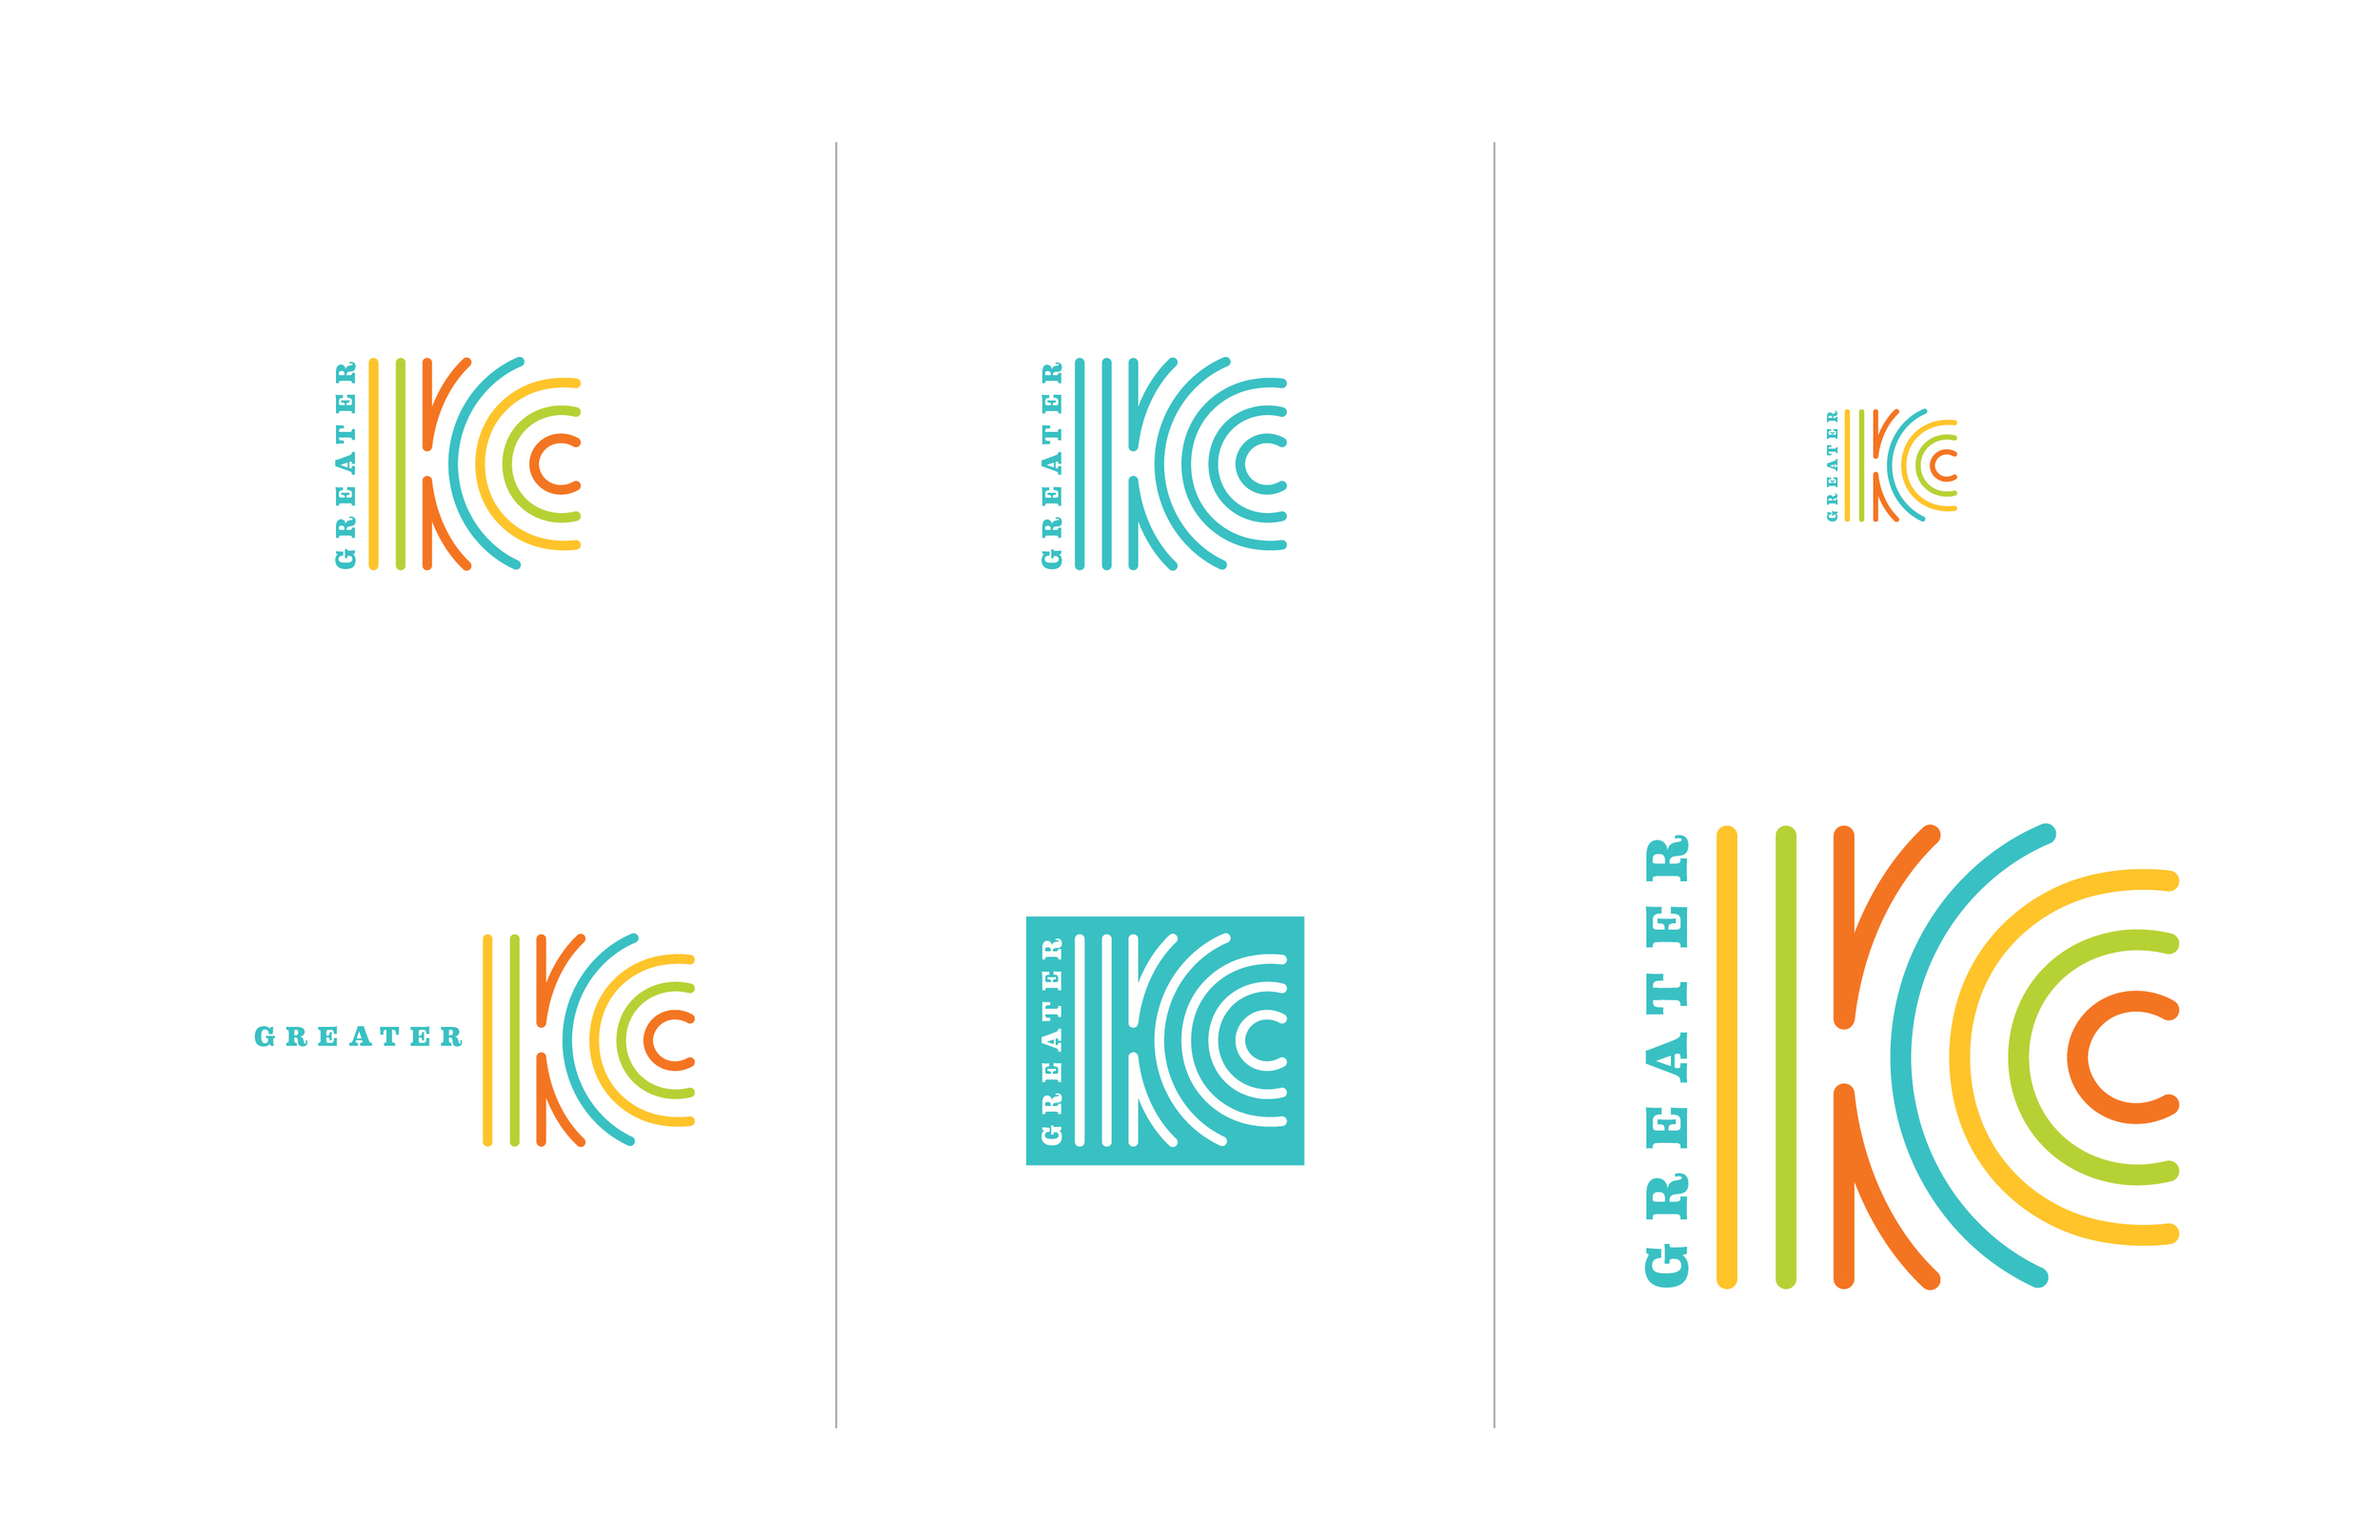 KCmorphologies2.jpg